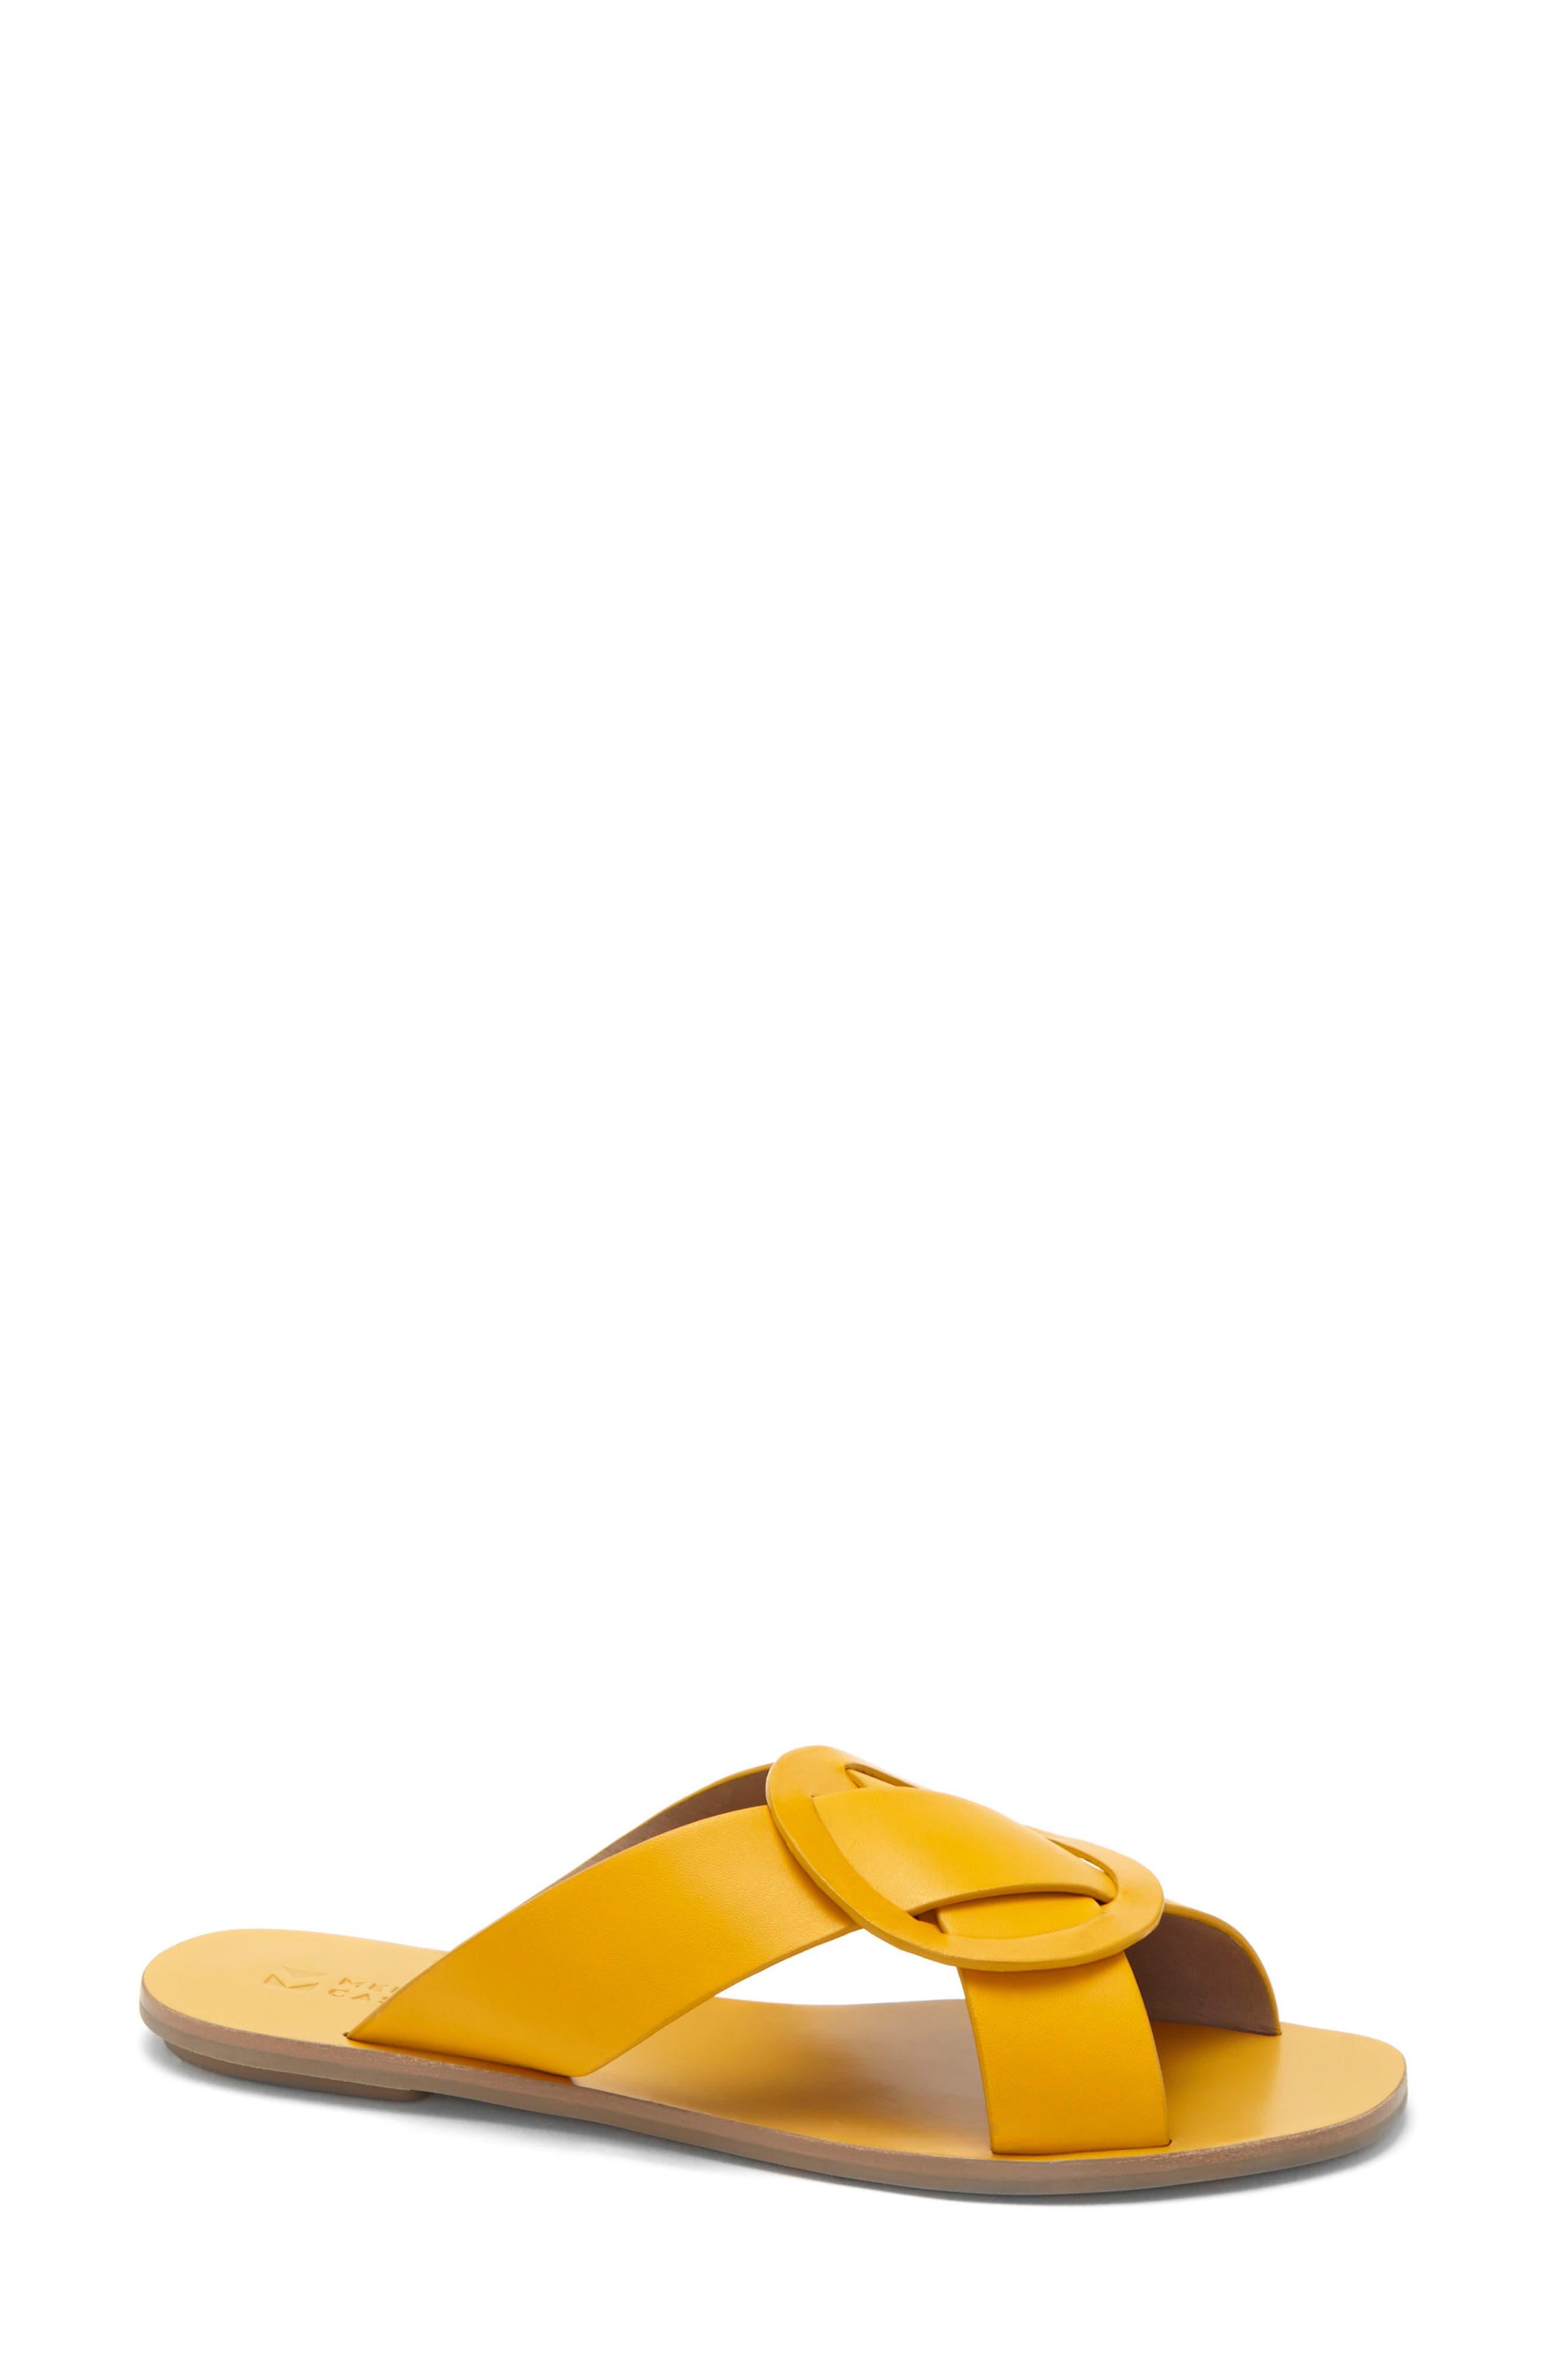 Carlein Slide Sandal,                         Main,                         color, Mustard Leather